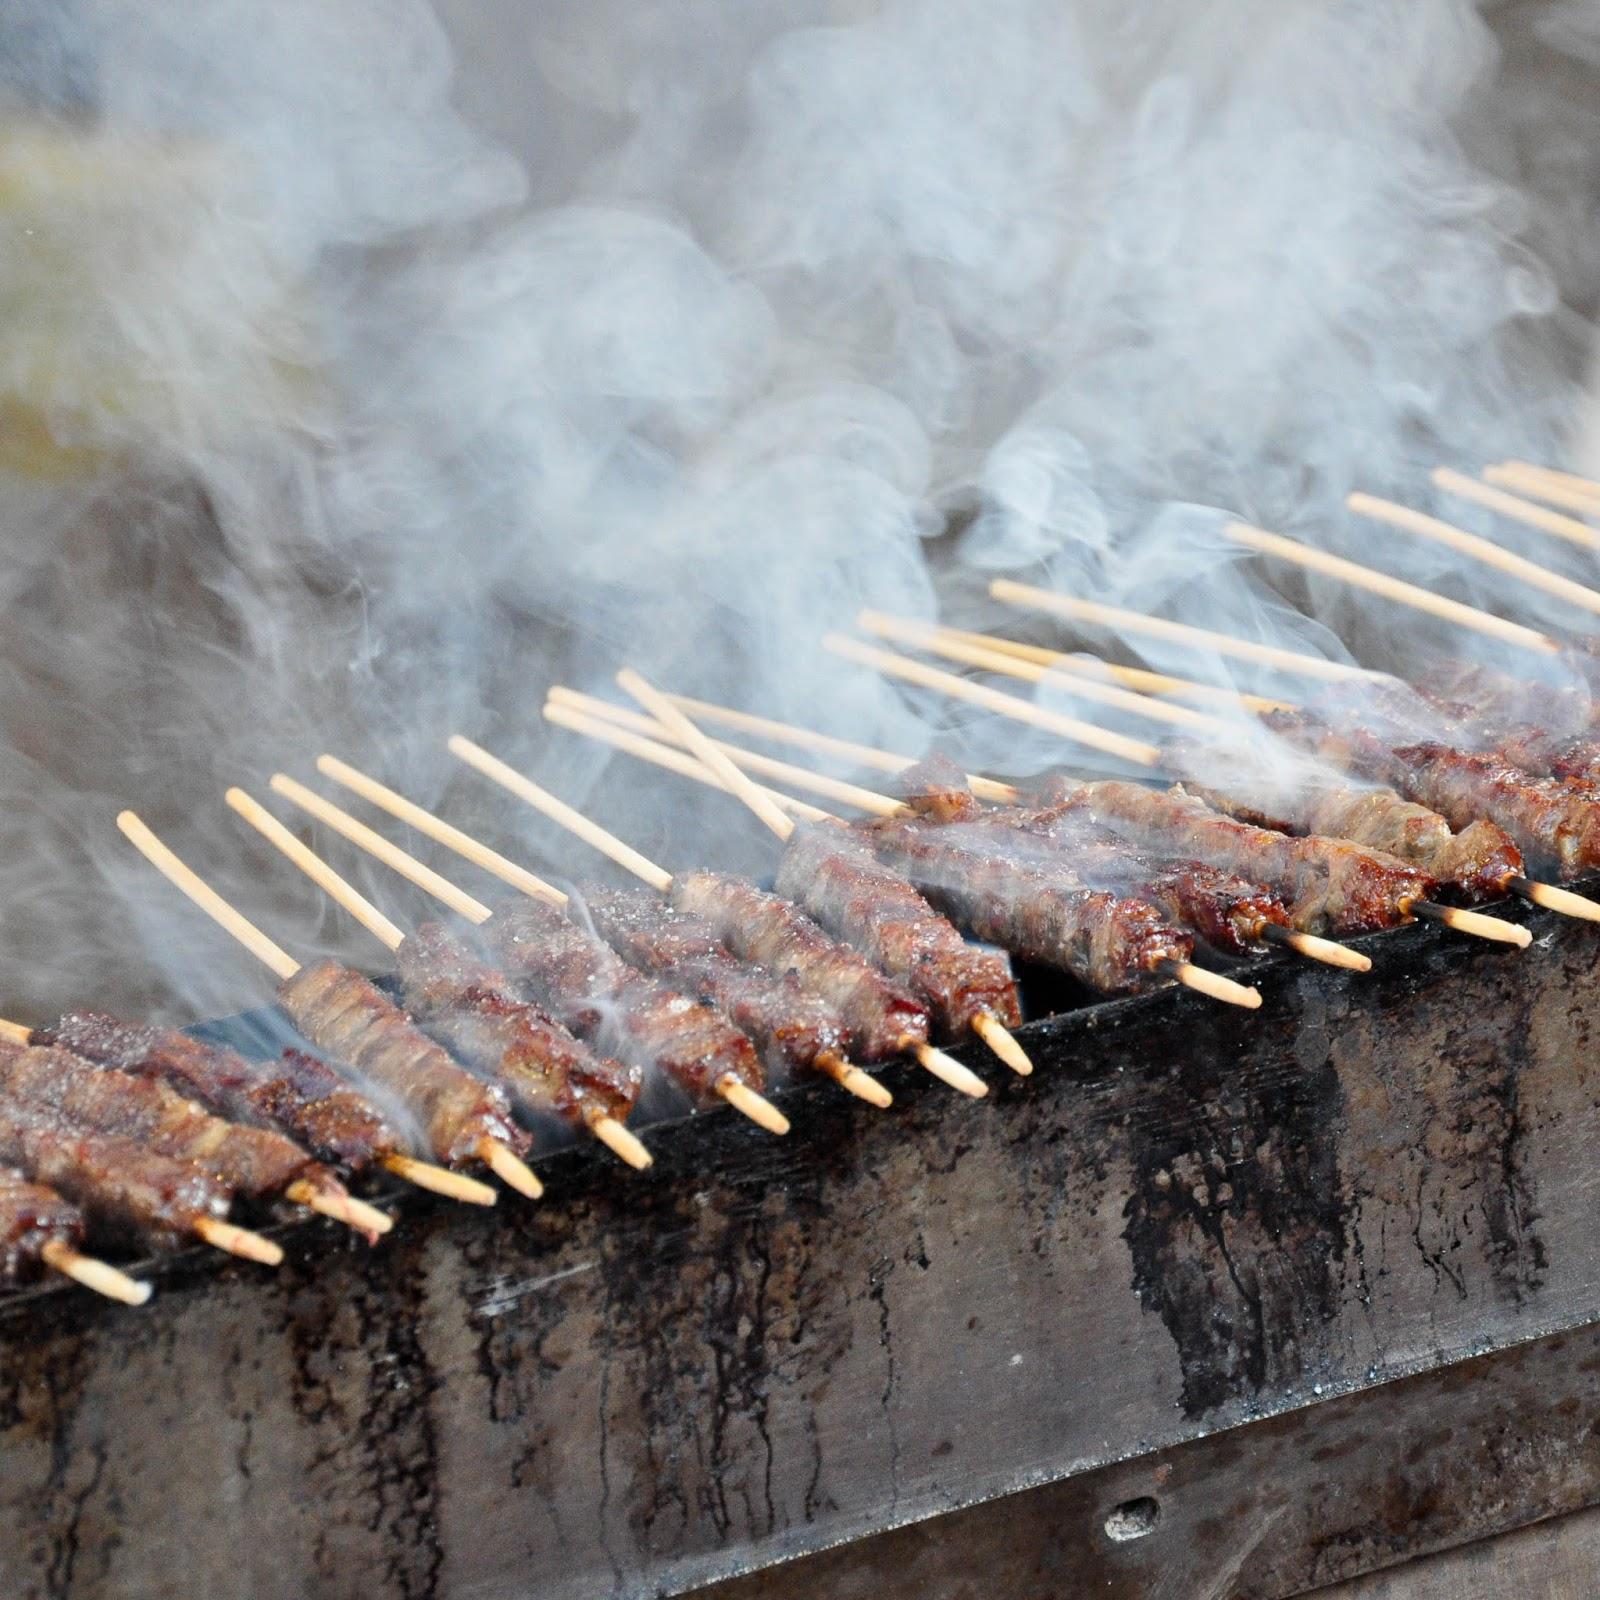 Arrosticini Thienesi roasted on coals, Thiene, Veneto, Italy